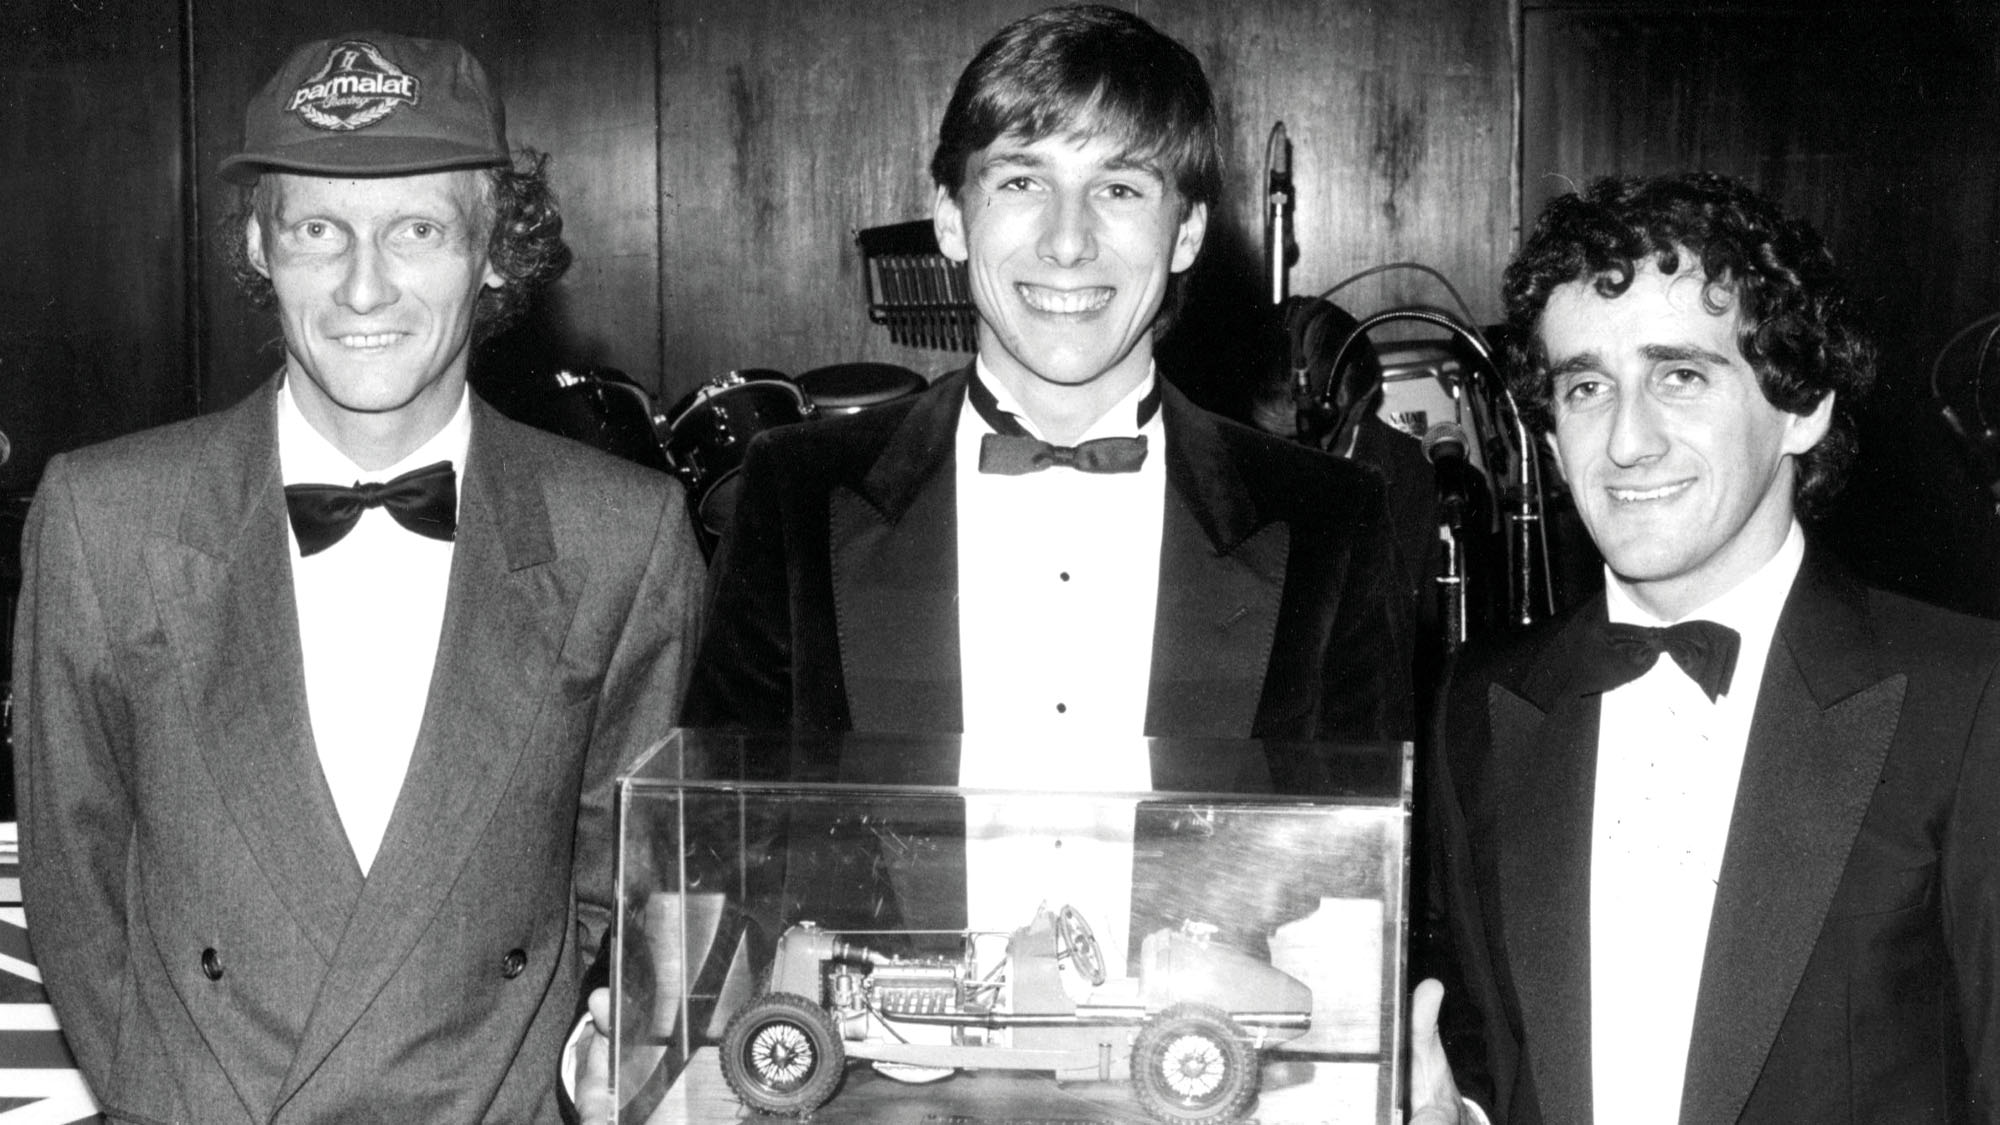 Johnny Dumfries Niki Lauda Alain Prost Grovewood Award 1983